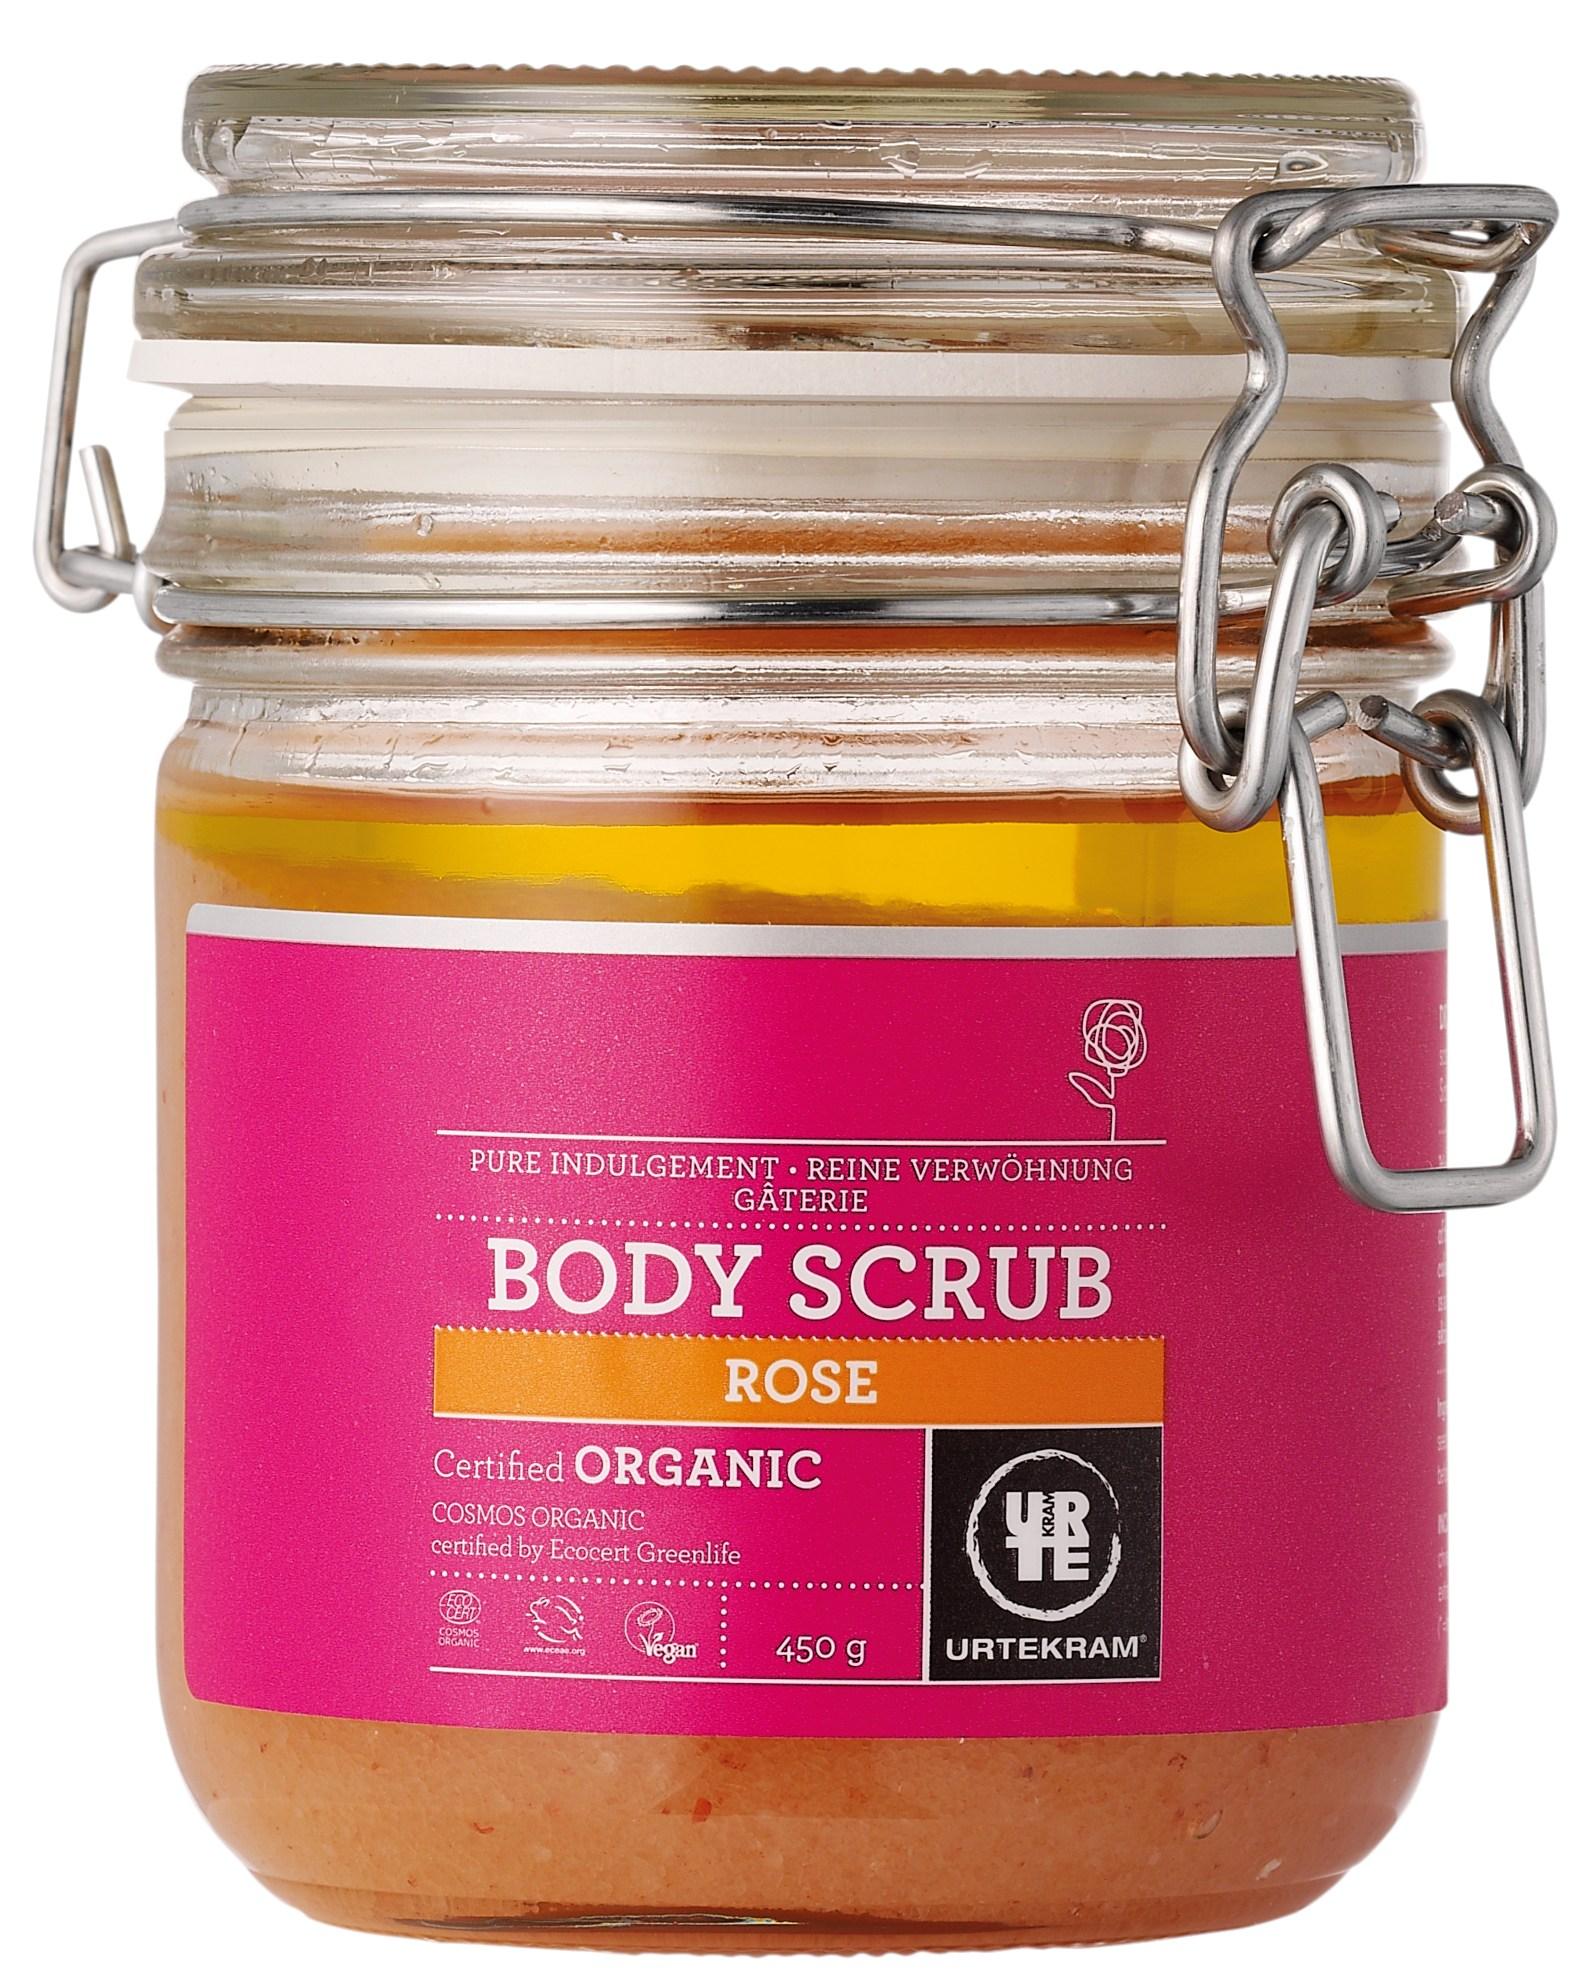 Urtekram Rose Himalaya Salt Body Scrub - 450 Gram